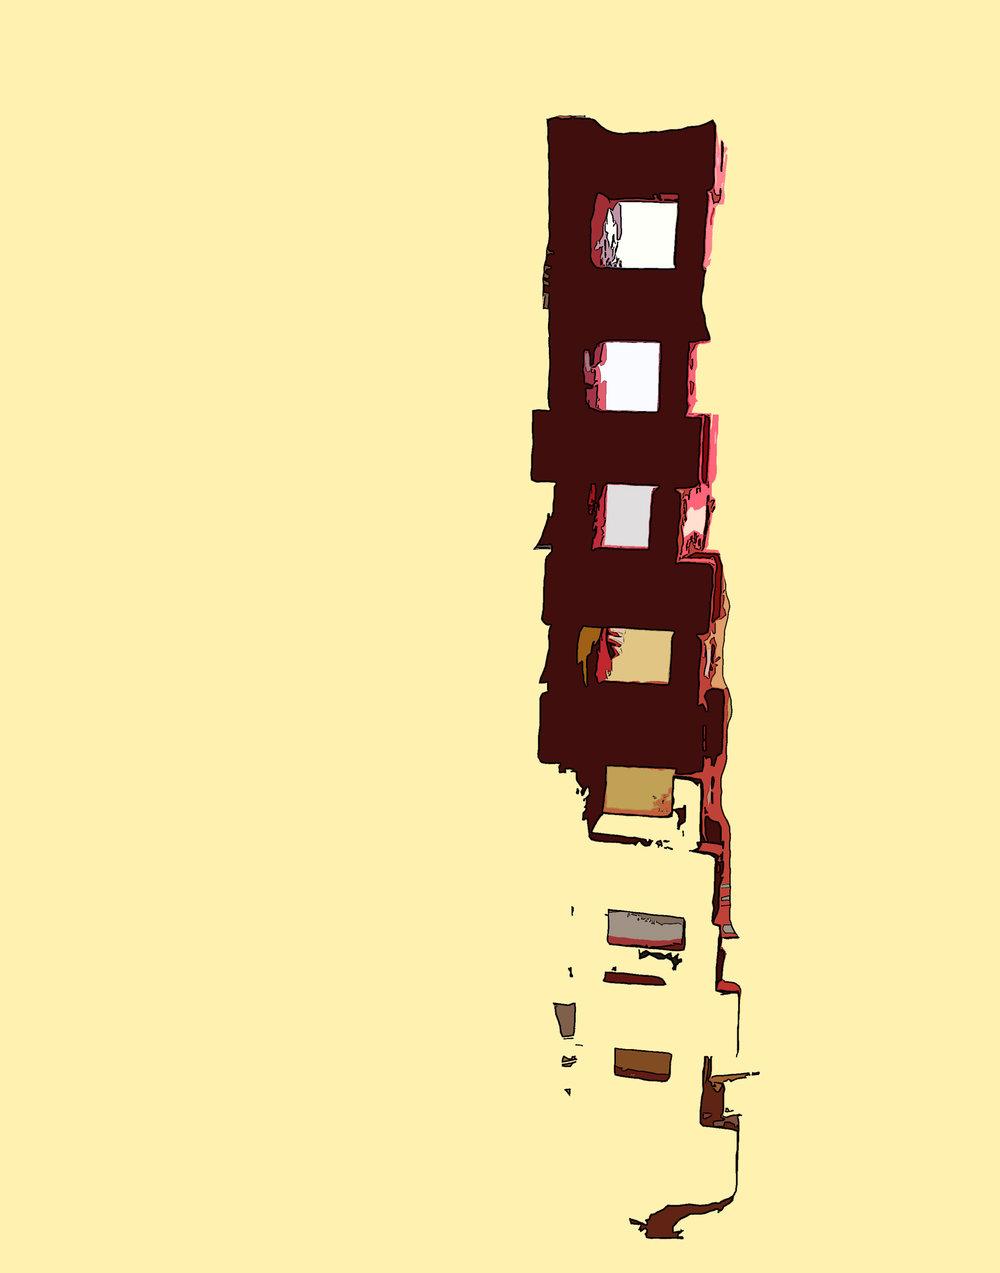 pale yellow tower_11x14.jpg